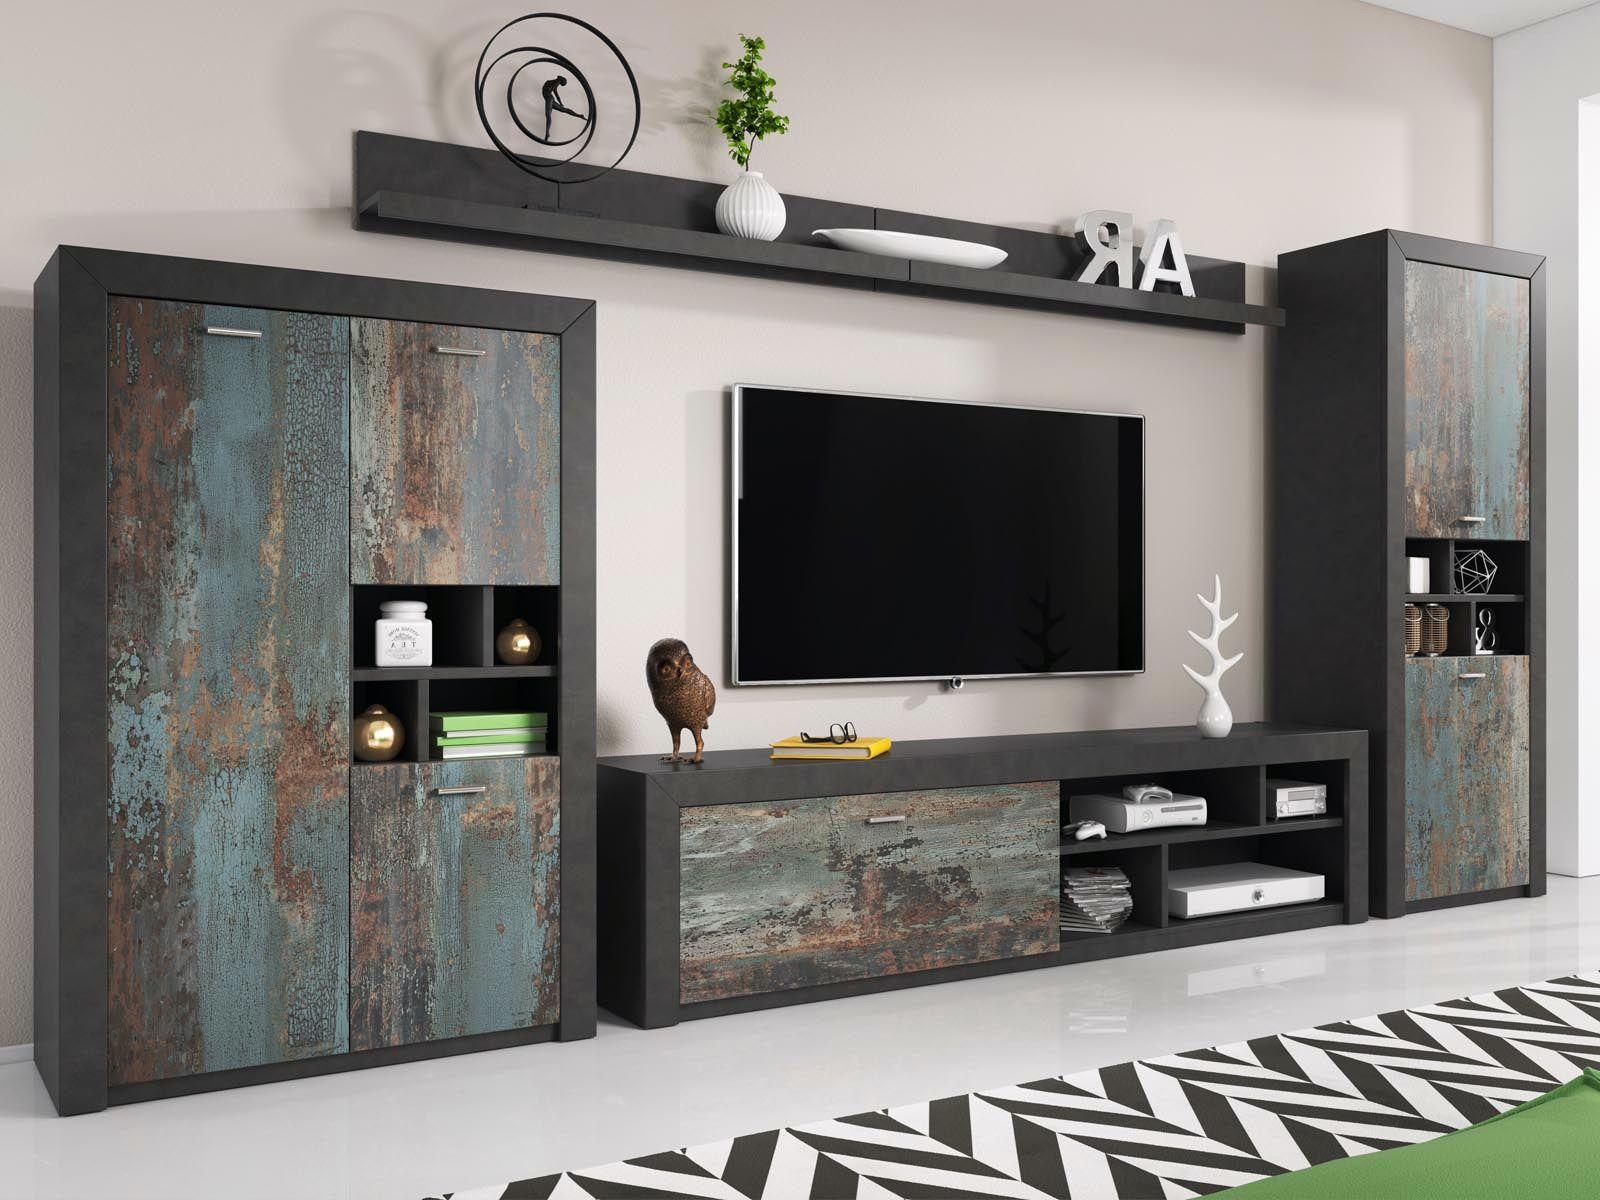 Mur Tv Hifi Norma Matera Canyon Effet Metal Mur Tv Meuble Tv Hifi Mobilier De Salon